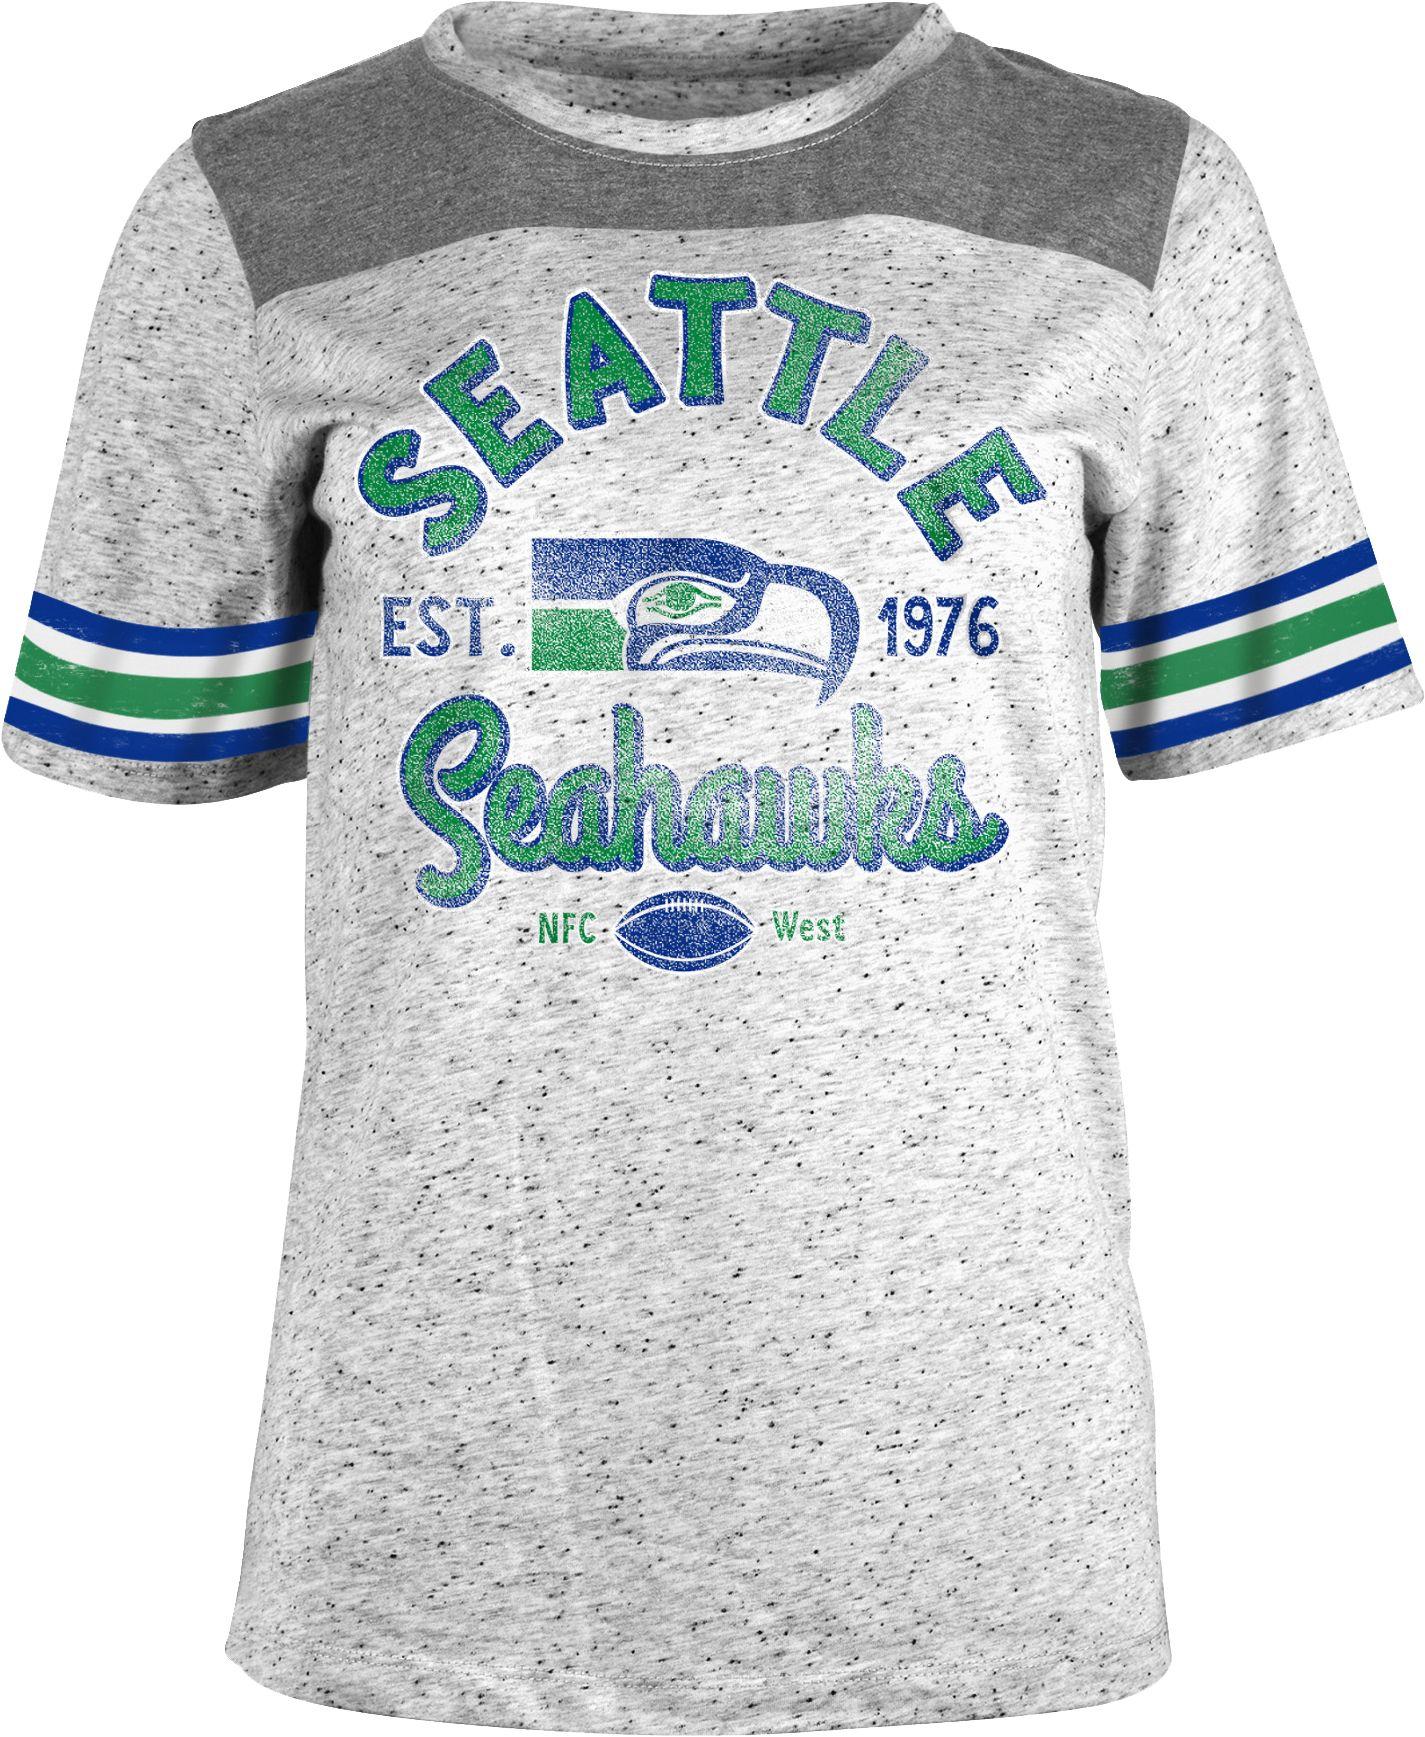 02f9a3d5c NFL Team Apparel Women s Seattle Seahawks Peppercorn Throwback Grey ...